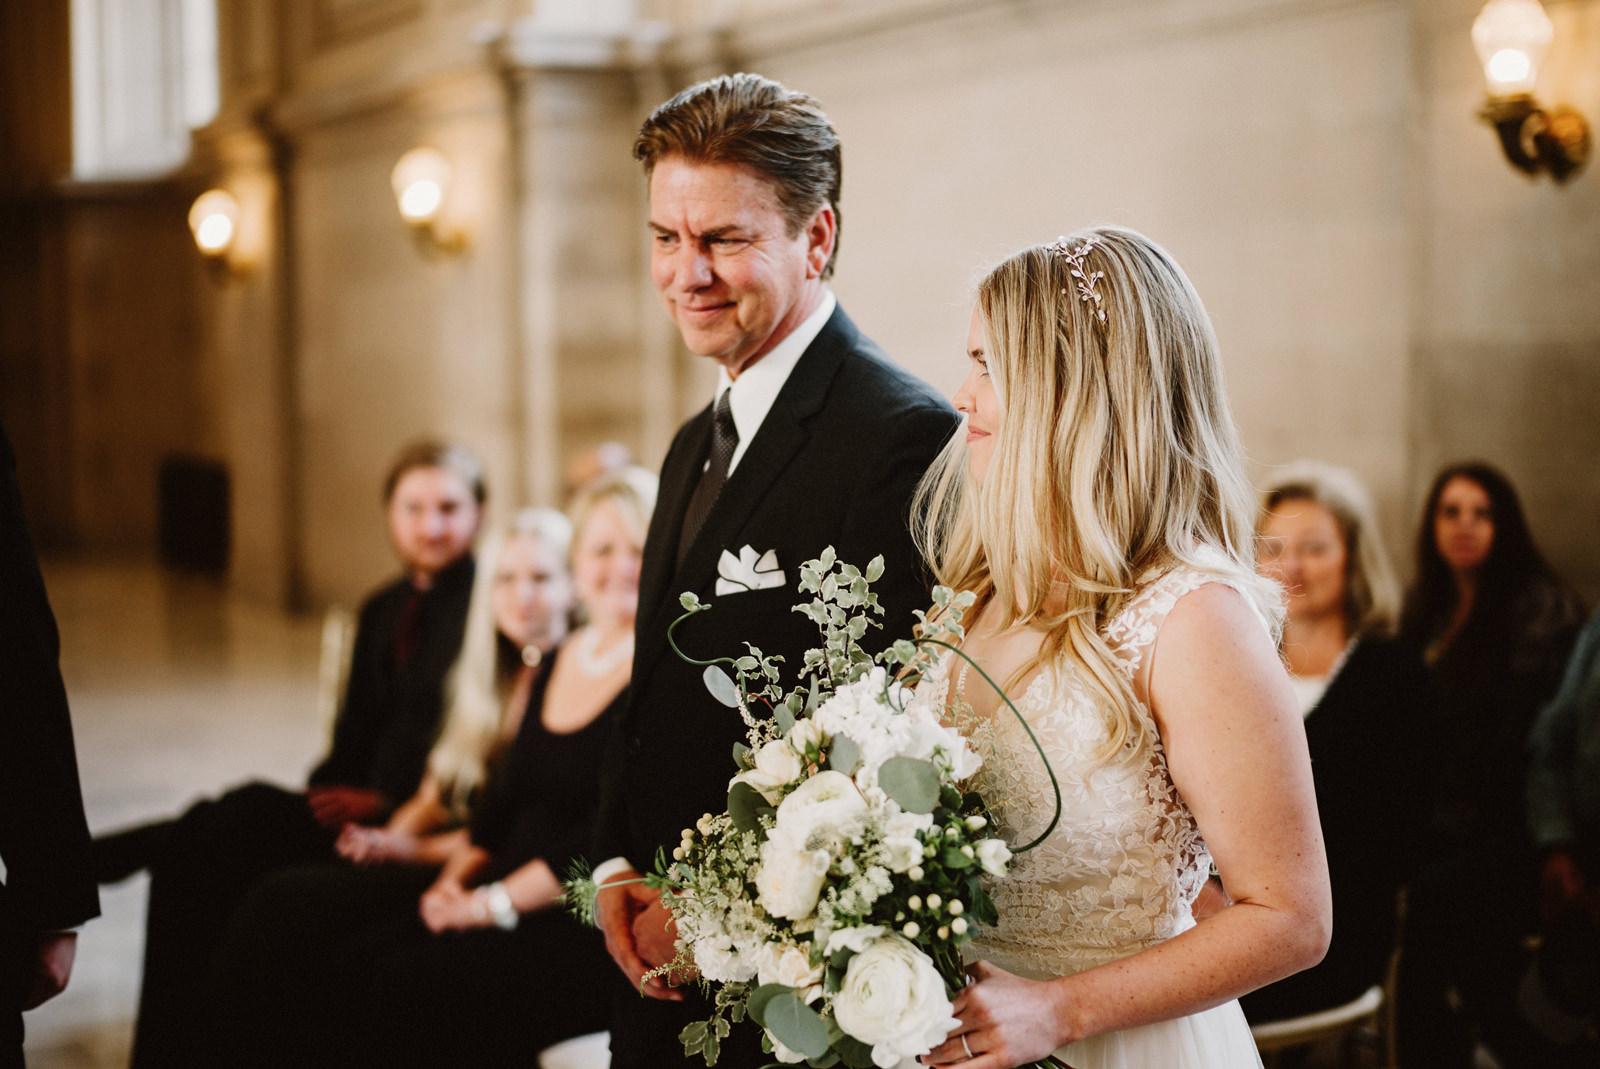 san-francisco-city-hall-elopement-13 SAN FRANCISCO CITY HALL INTIMATE WEDDING